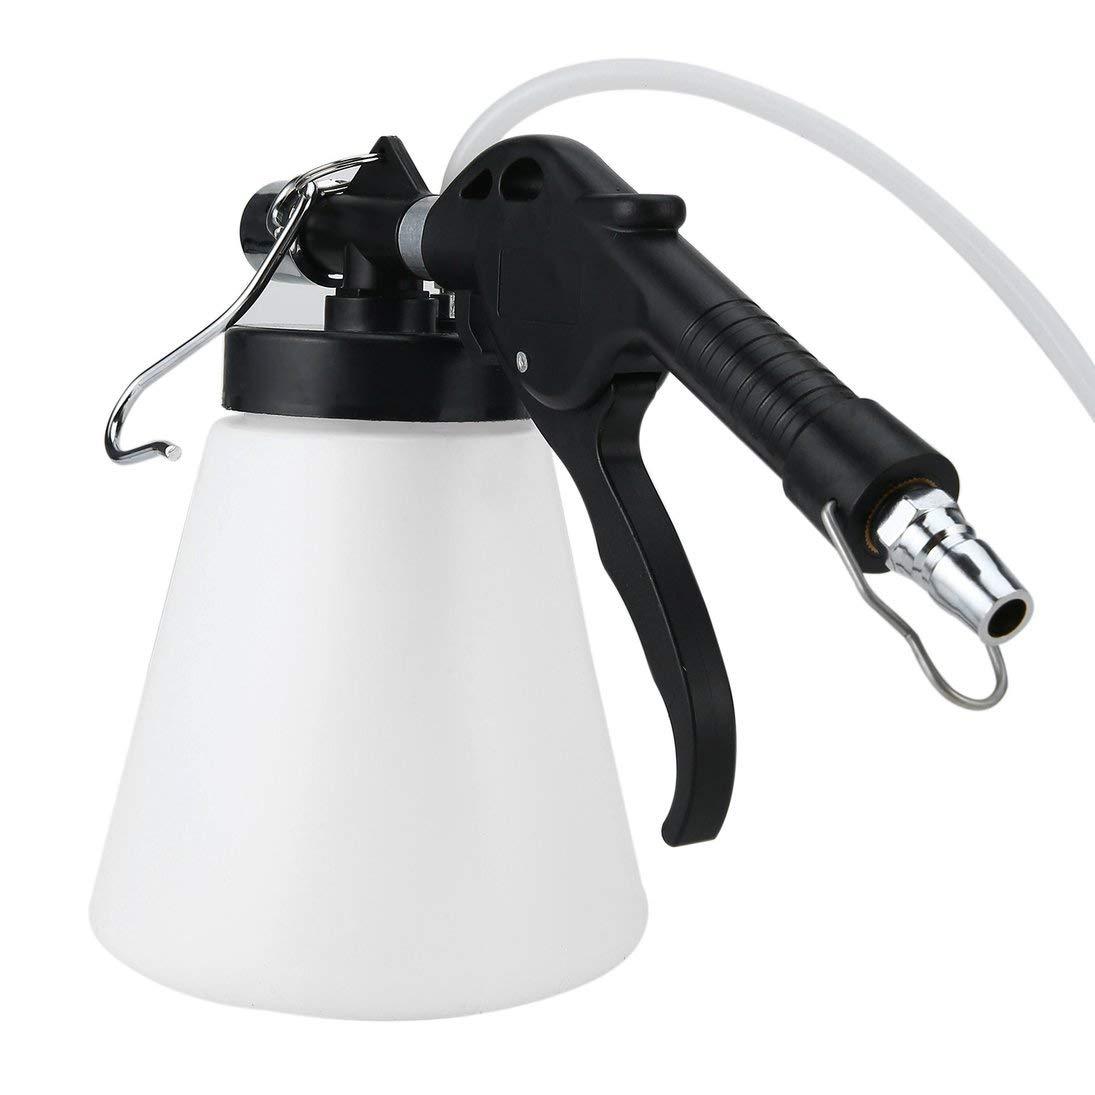 Baynne 87-174psi Air Pressure 0.75L Air Brake Bleeder Kit Pneumatic Brake Clutch Vacuum Hydraulic Fluid Fill Bottle Kit Accessory by Baynne (Image #5)